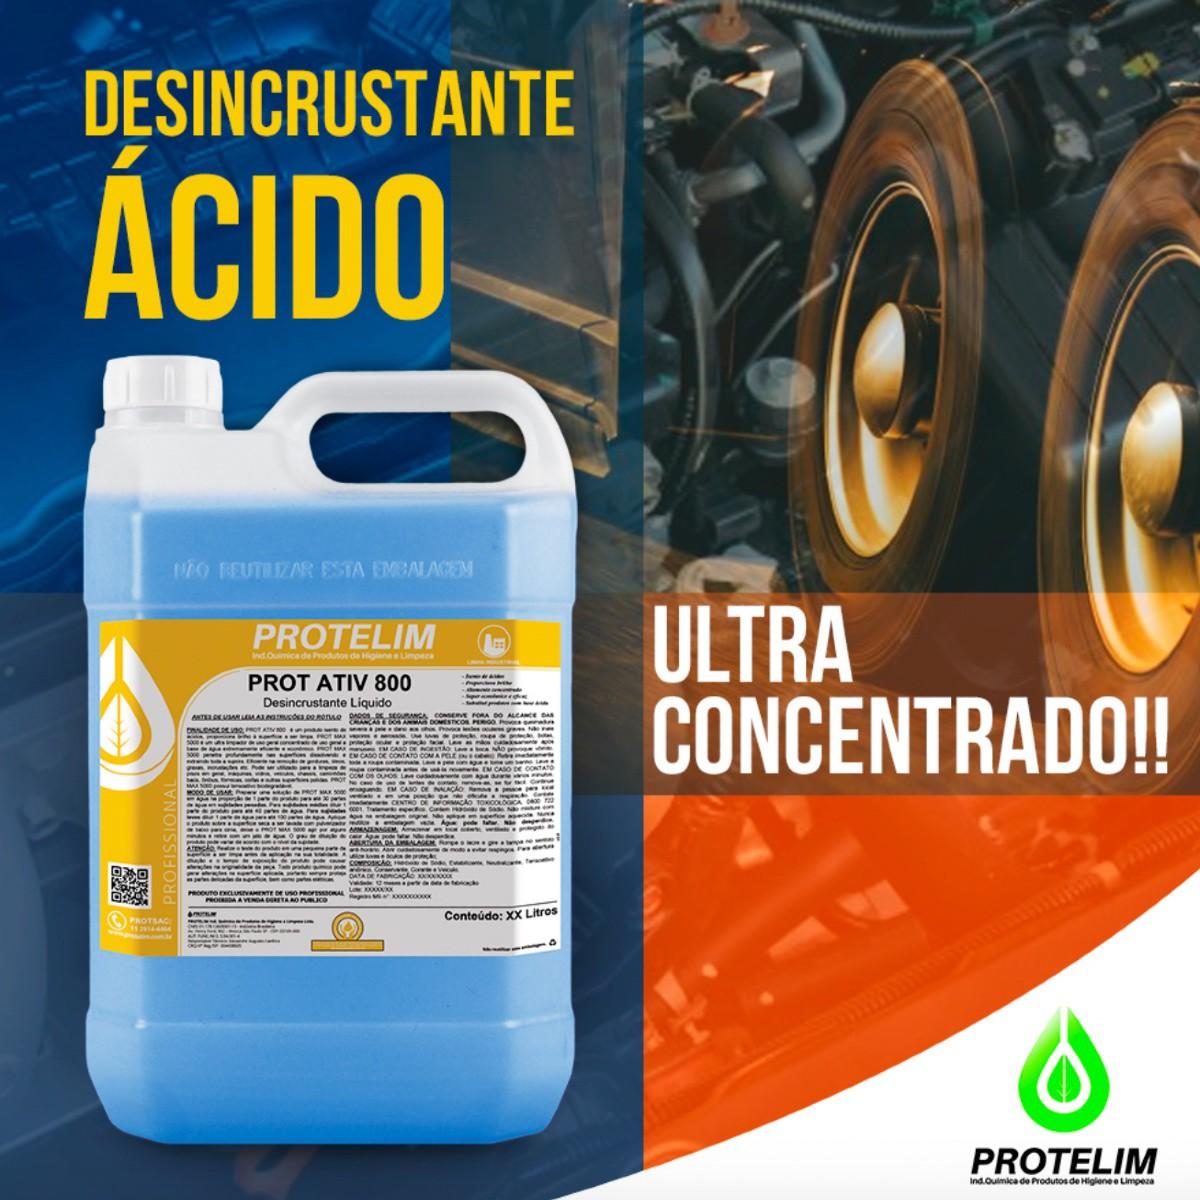 Kit Limpeza Pesada Protelim Prot Multi 200 + Prot Ativ 800